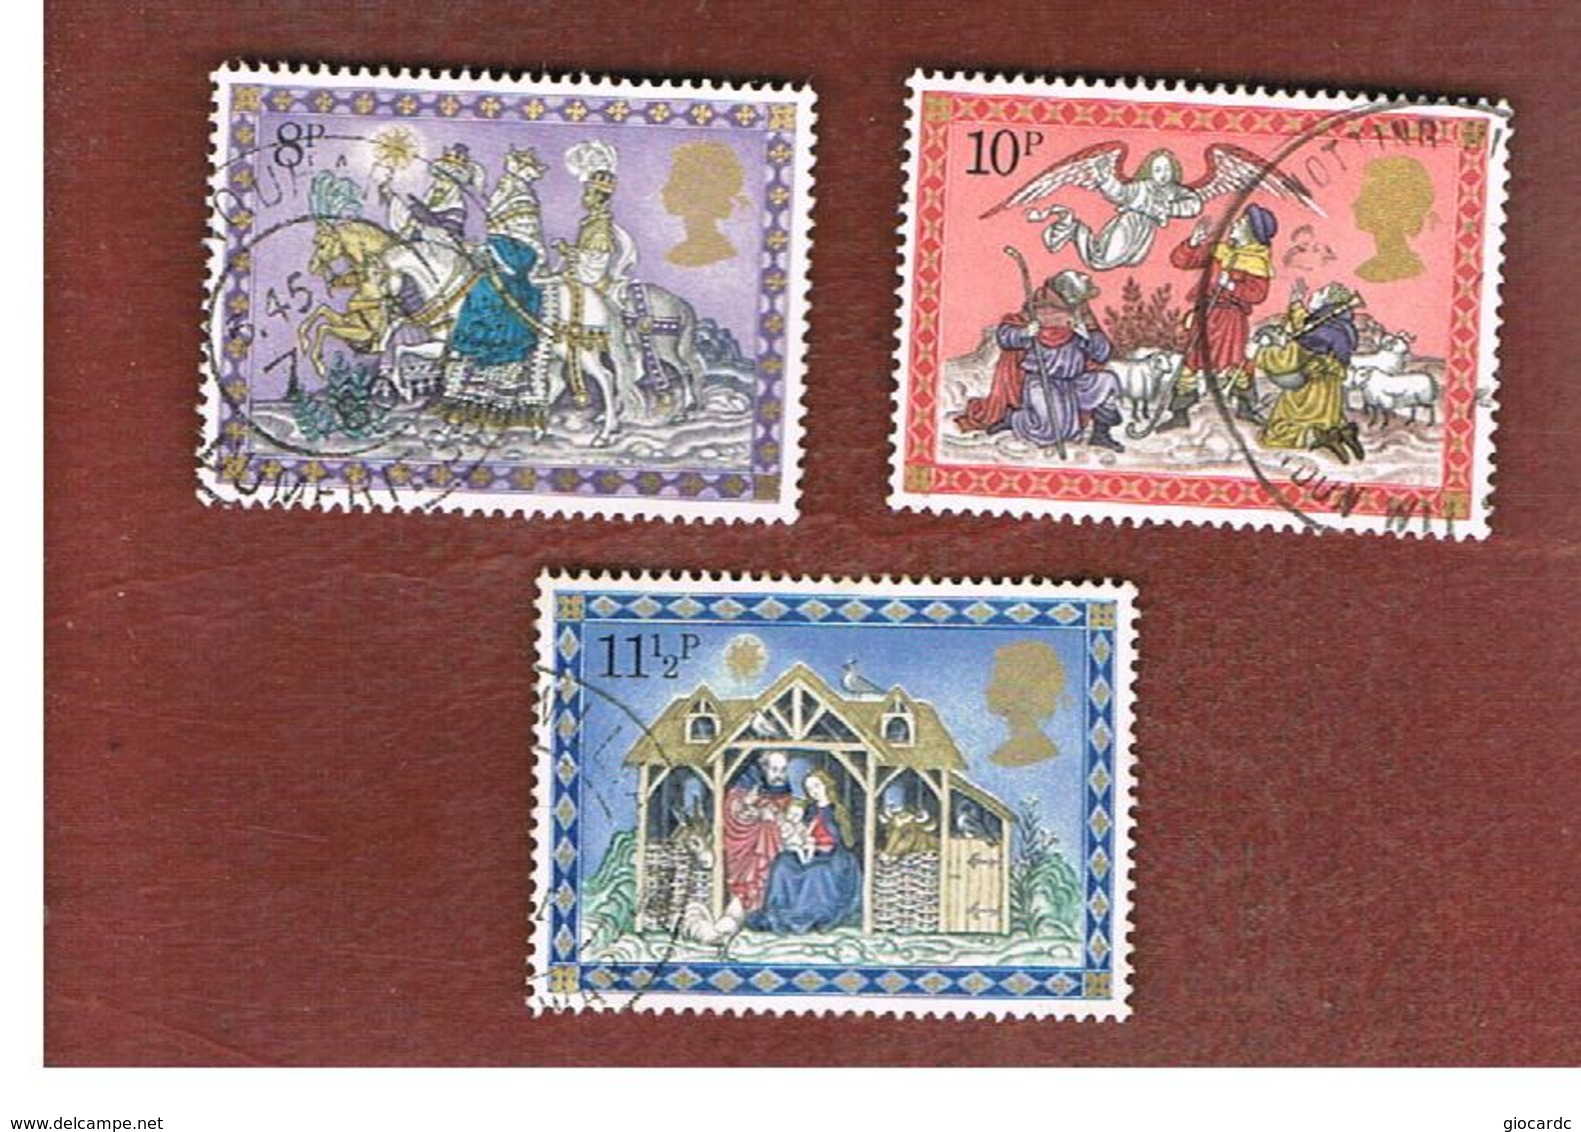 GRAN BRETAGNA (UNITED KINGDOM) -  SG 1104.1106  -  1979 CHRISTMAS  - USED - Usati